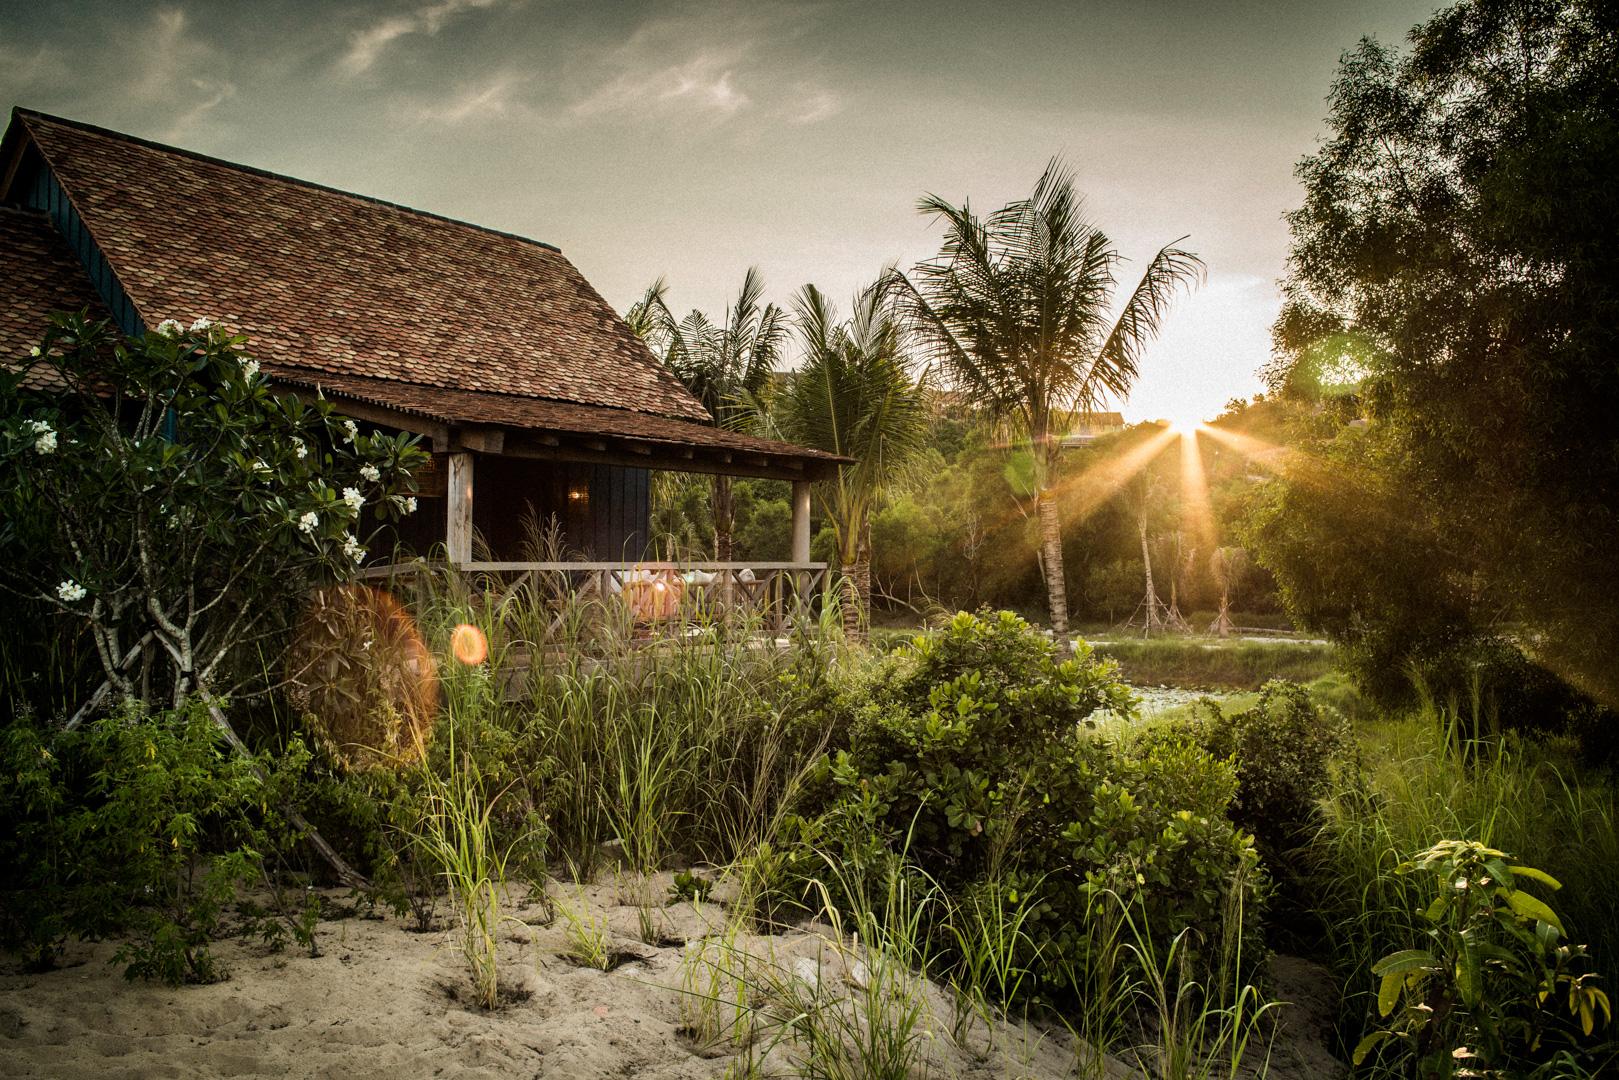 Zannier-Hotels-Bãi-San-Hô-Beach-Pool-Villa-Exterior-2-©-Frederik-Wissink-for-Zannier-Hotels